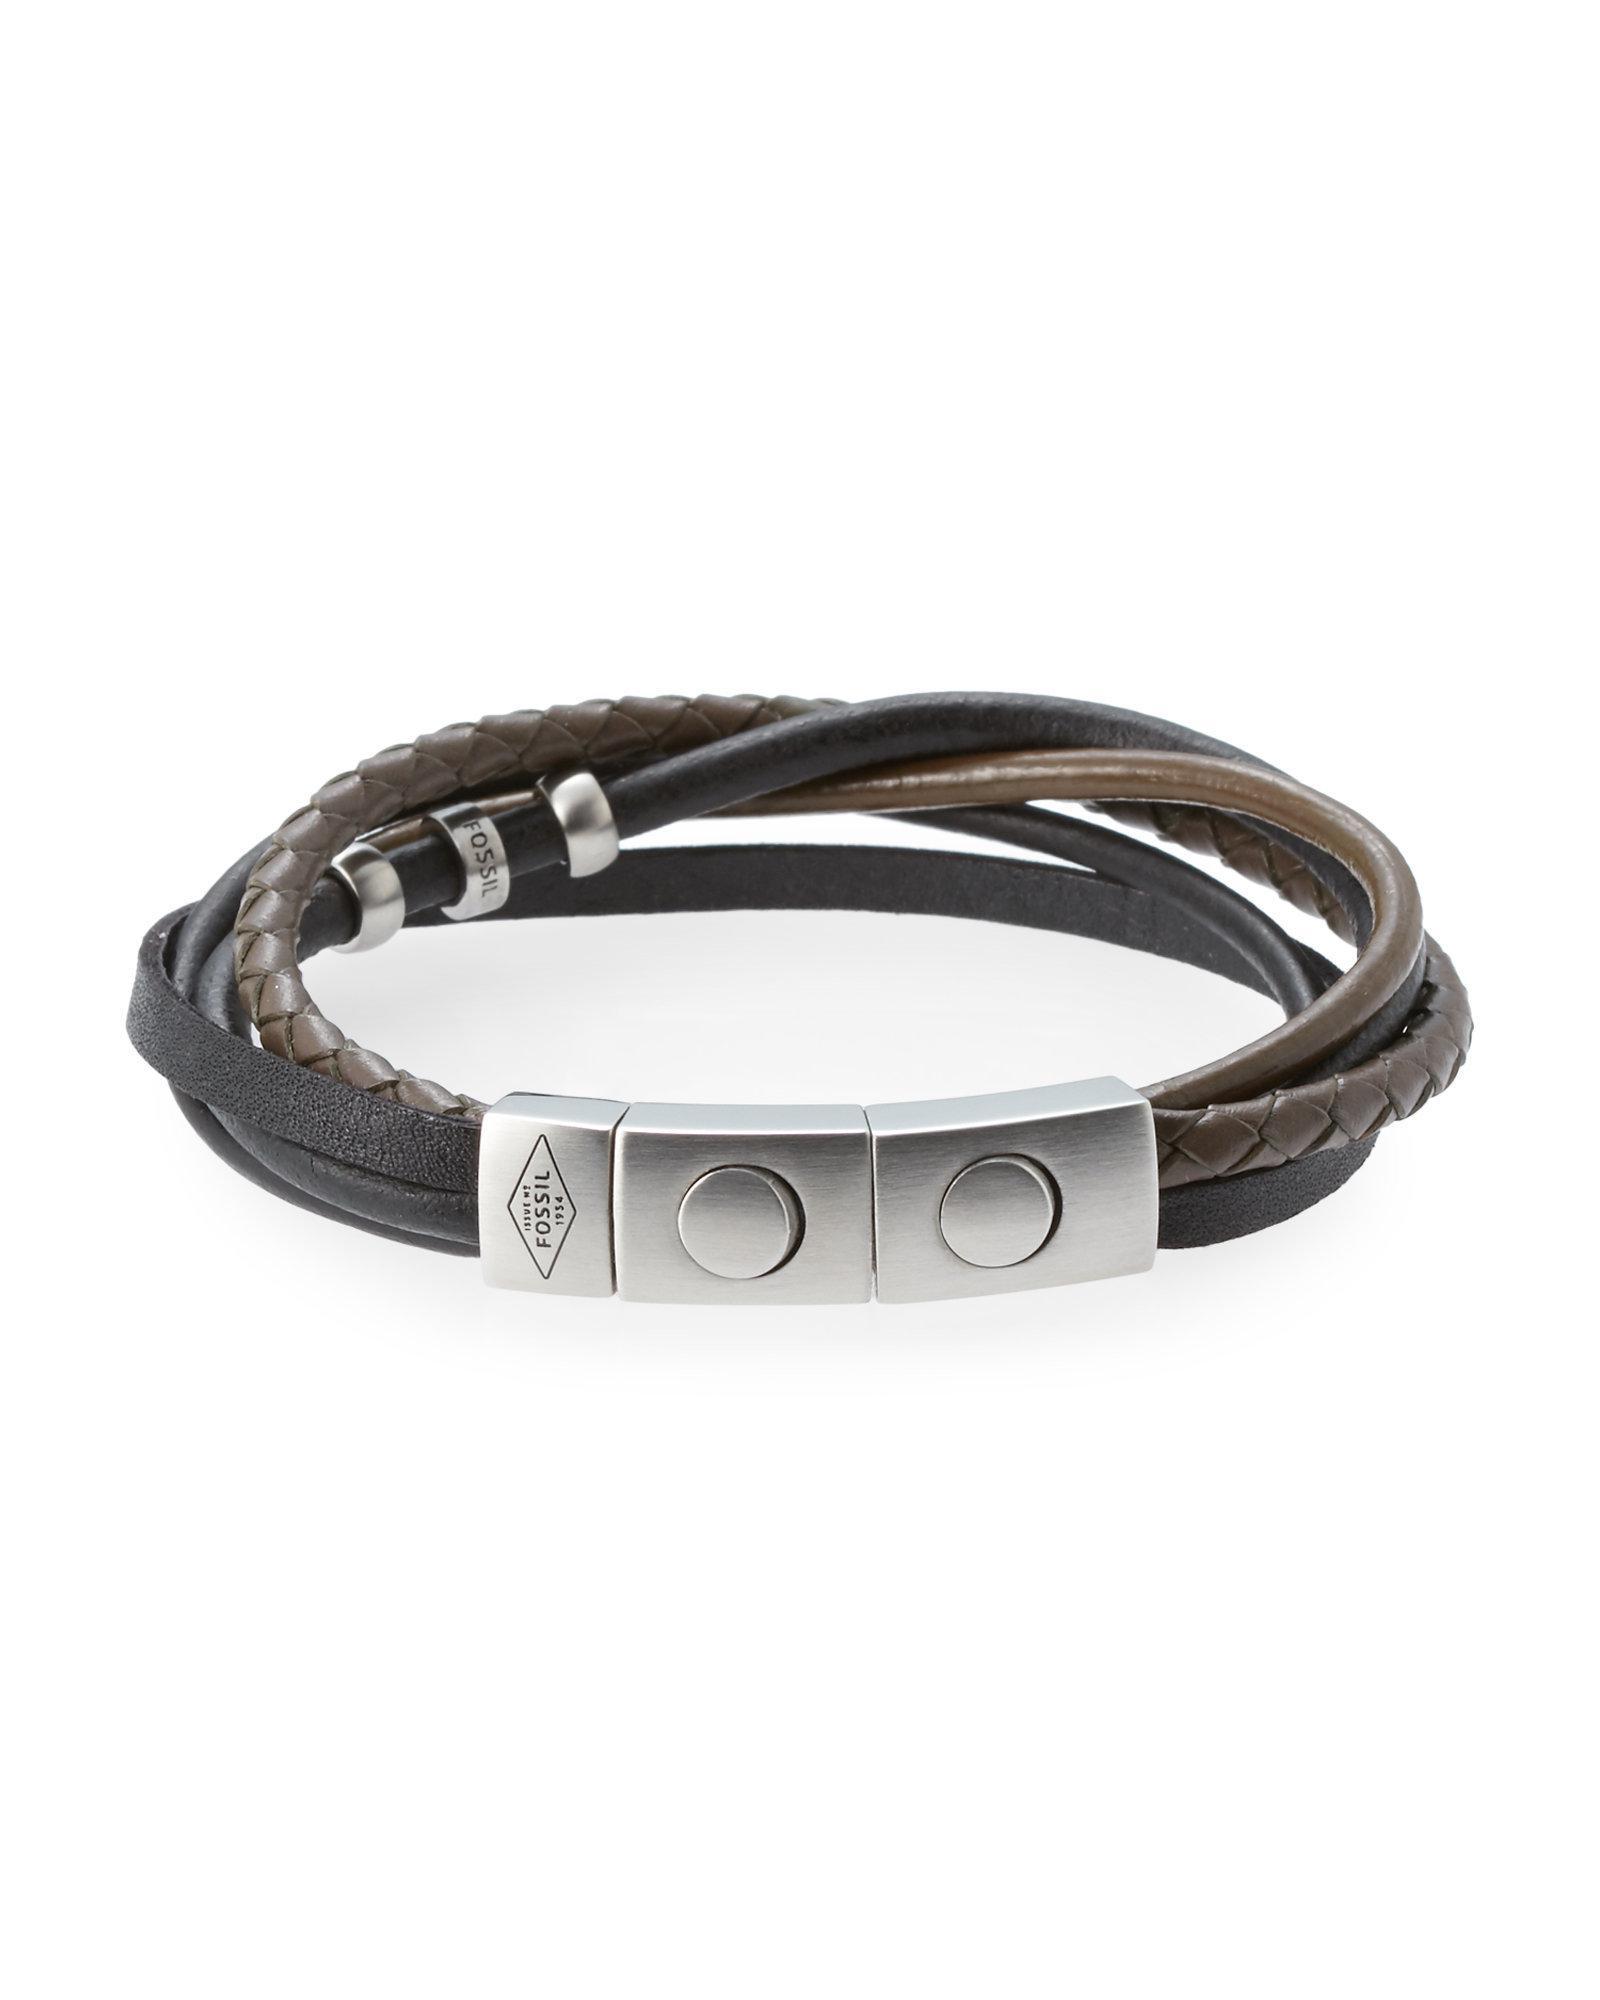 23b40b4c4b1 Fossil Black & Olive Braided Leather Bracelet in Black for Men - Lyst